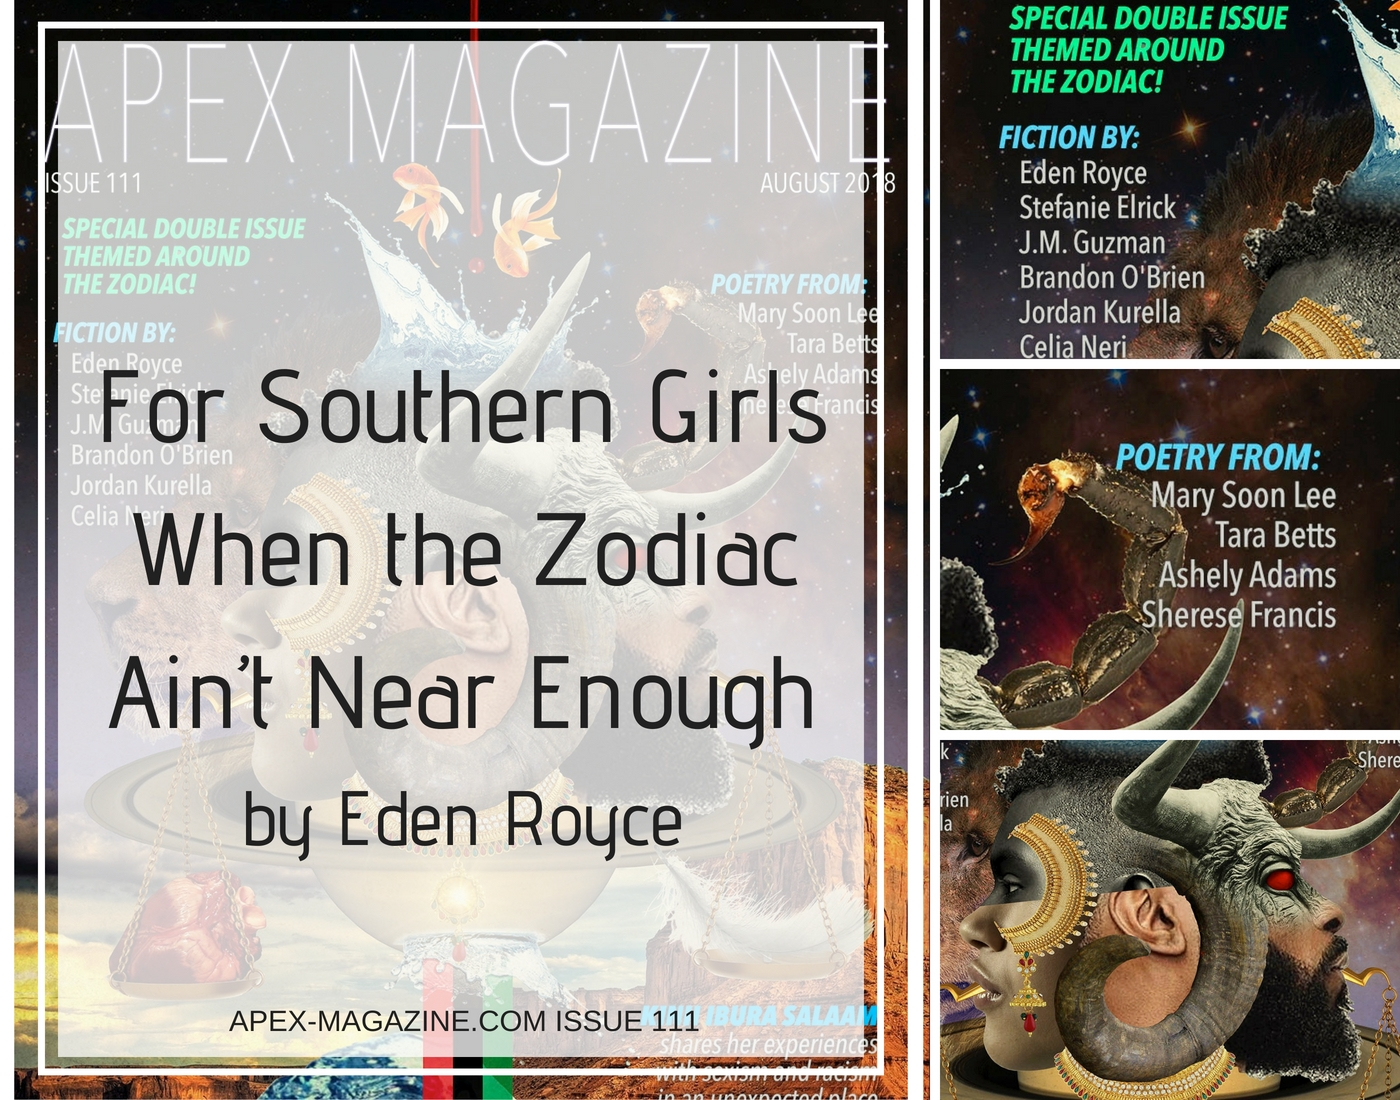 For Southern Girls When the Zodiac Ain't Near Enough